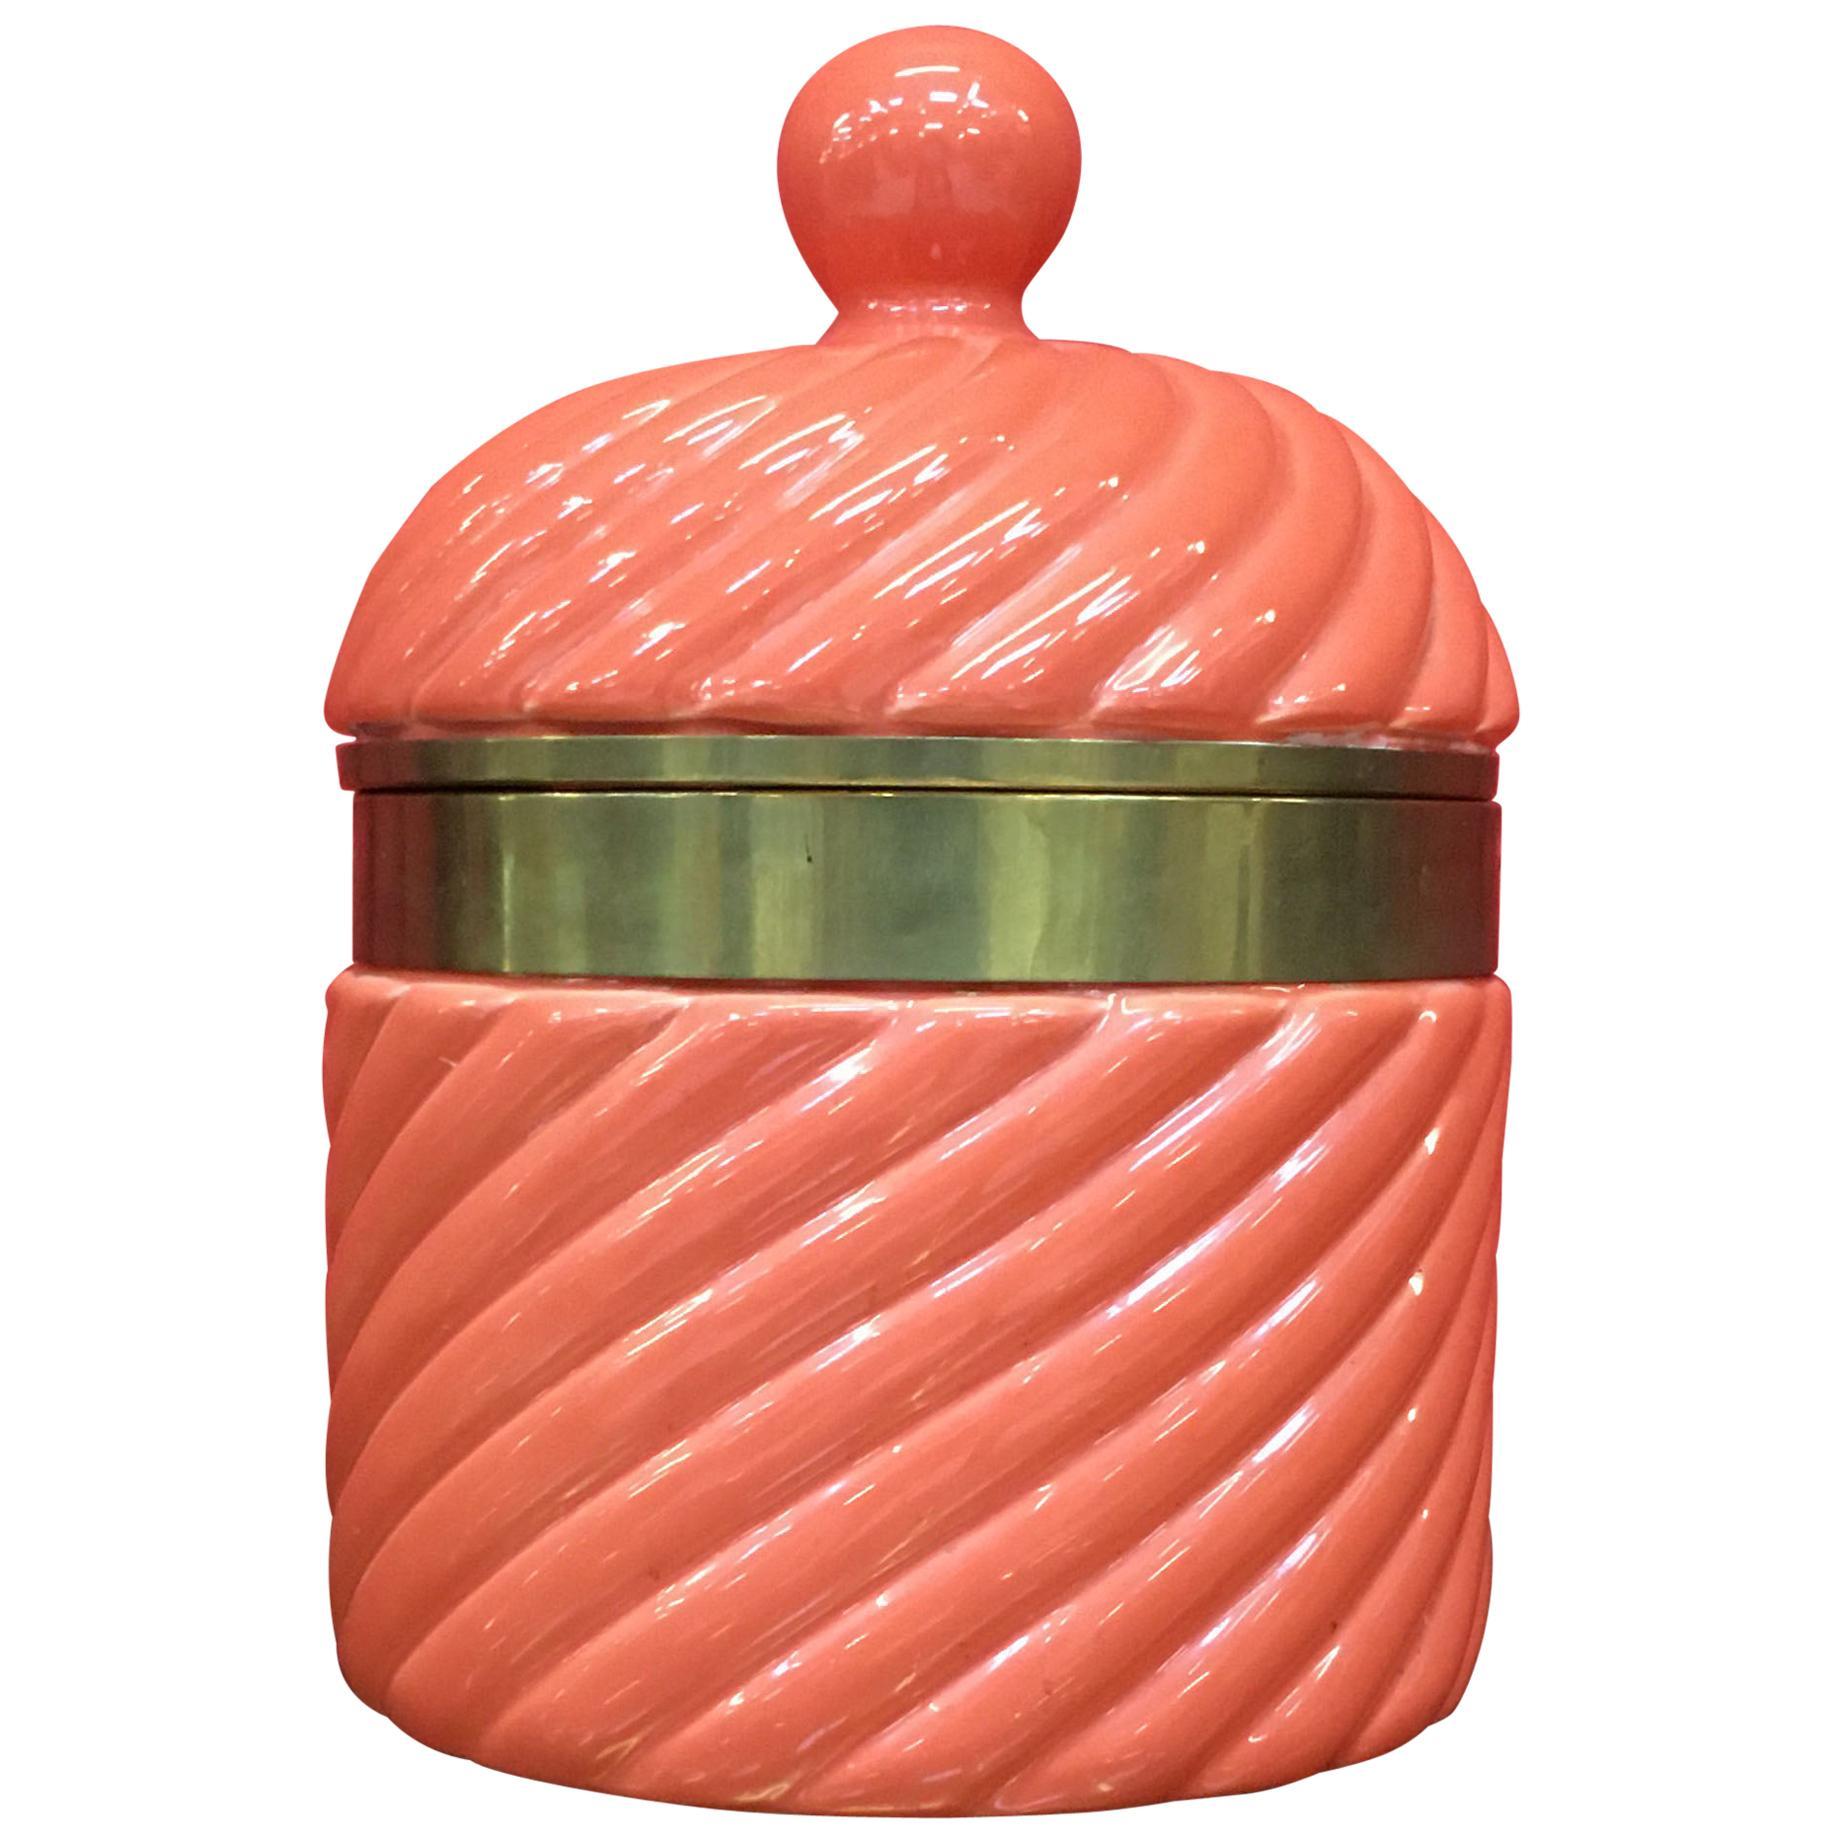 1960s Large Italian Ceramic Ice Bucket by Tommaso Barbi